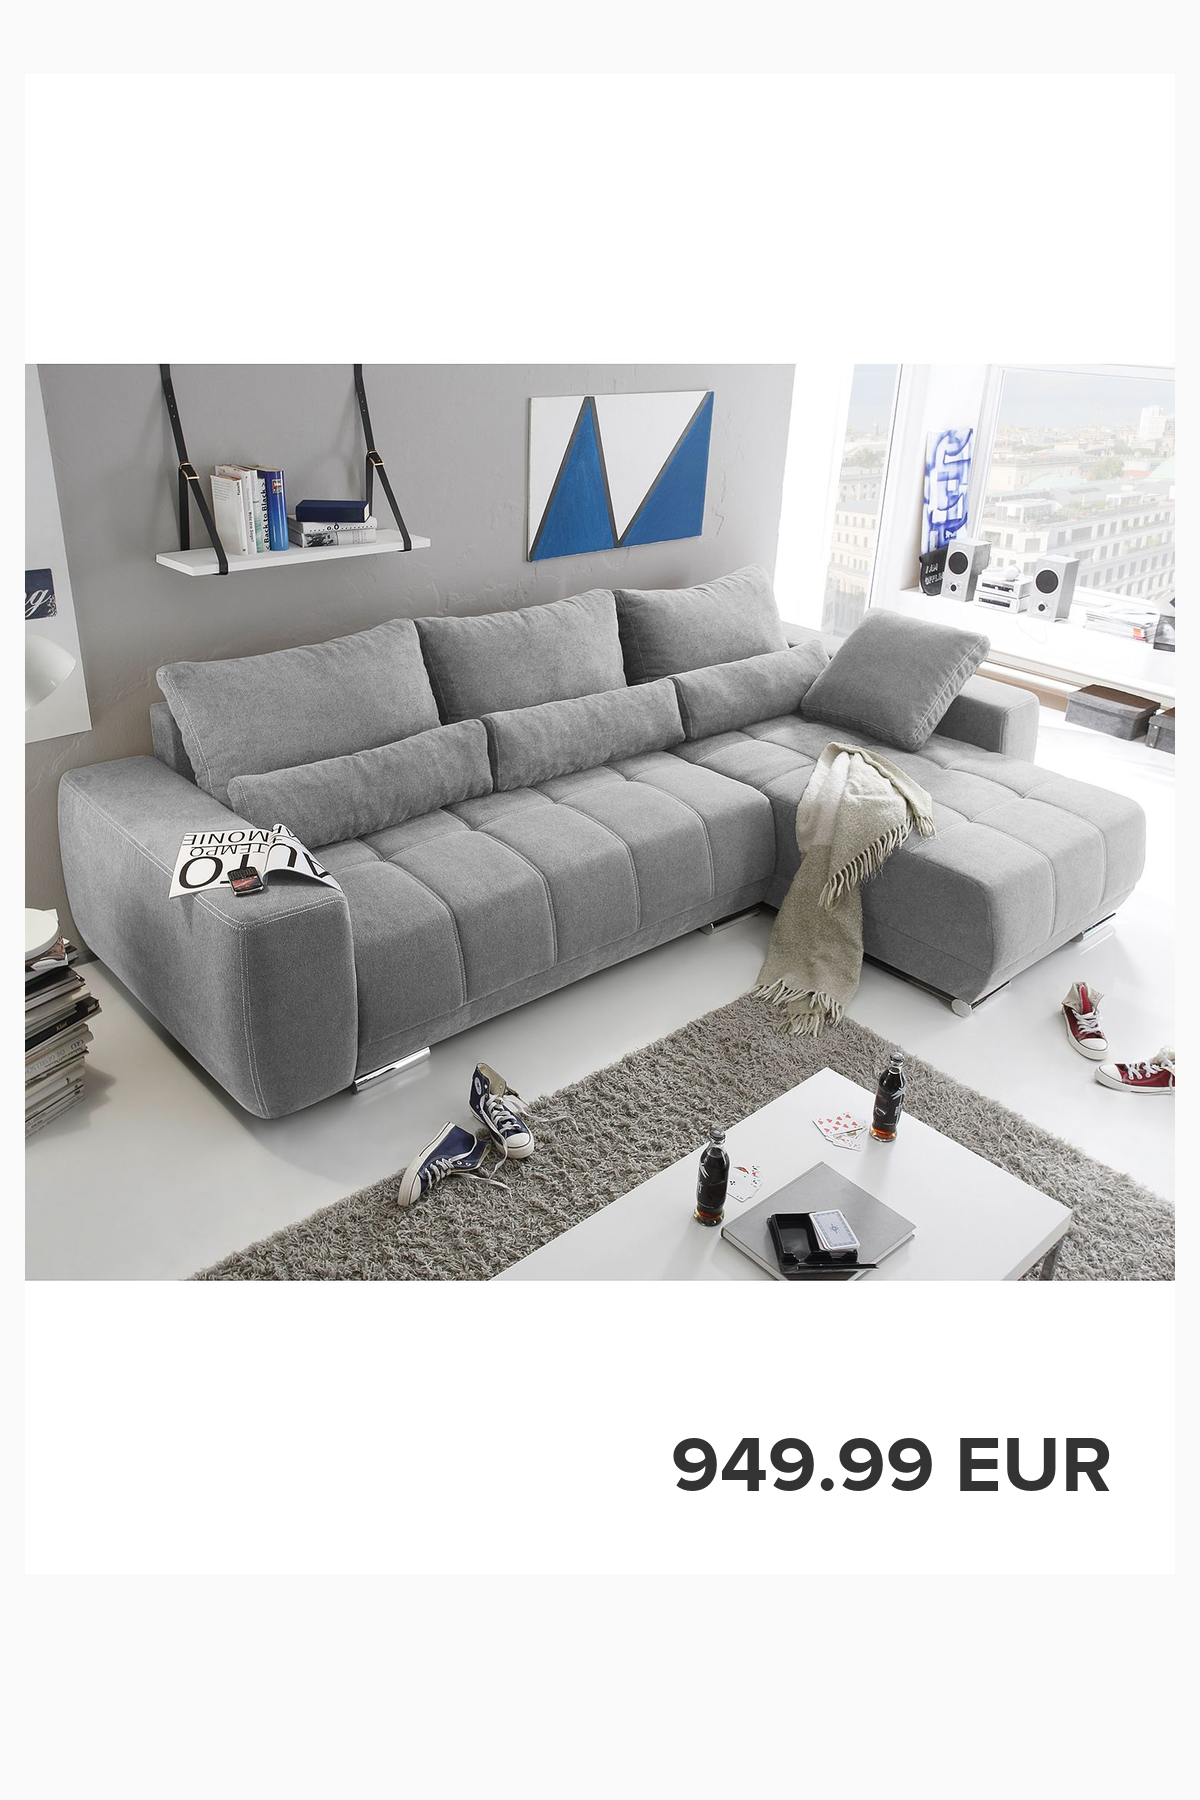 Fredriks Ecksofa Galilea Granit Microfaser 305x90x189 Cm Mit Schlaffunktion Living Room Designs Ikea Living Room Home Decor